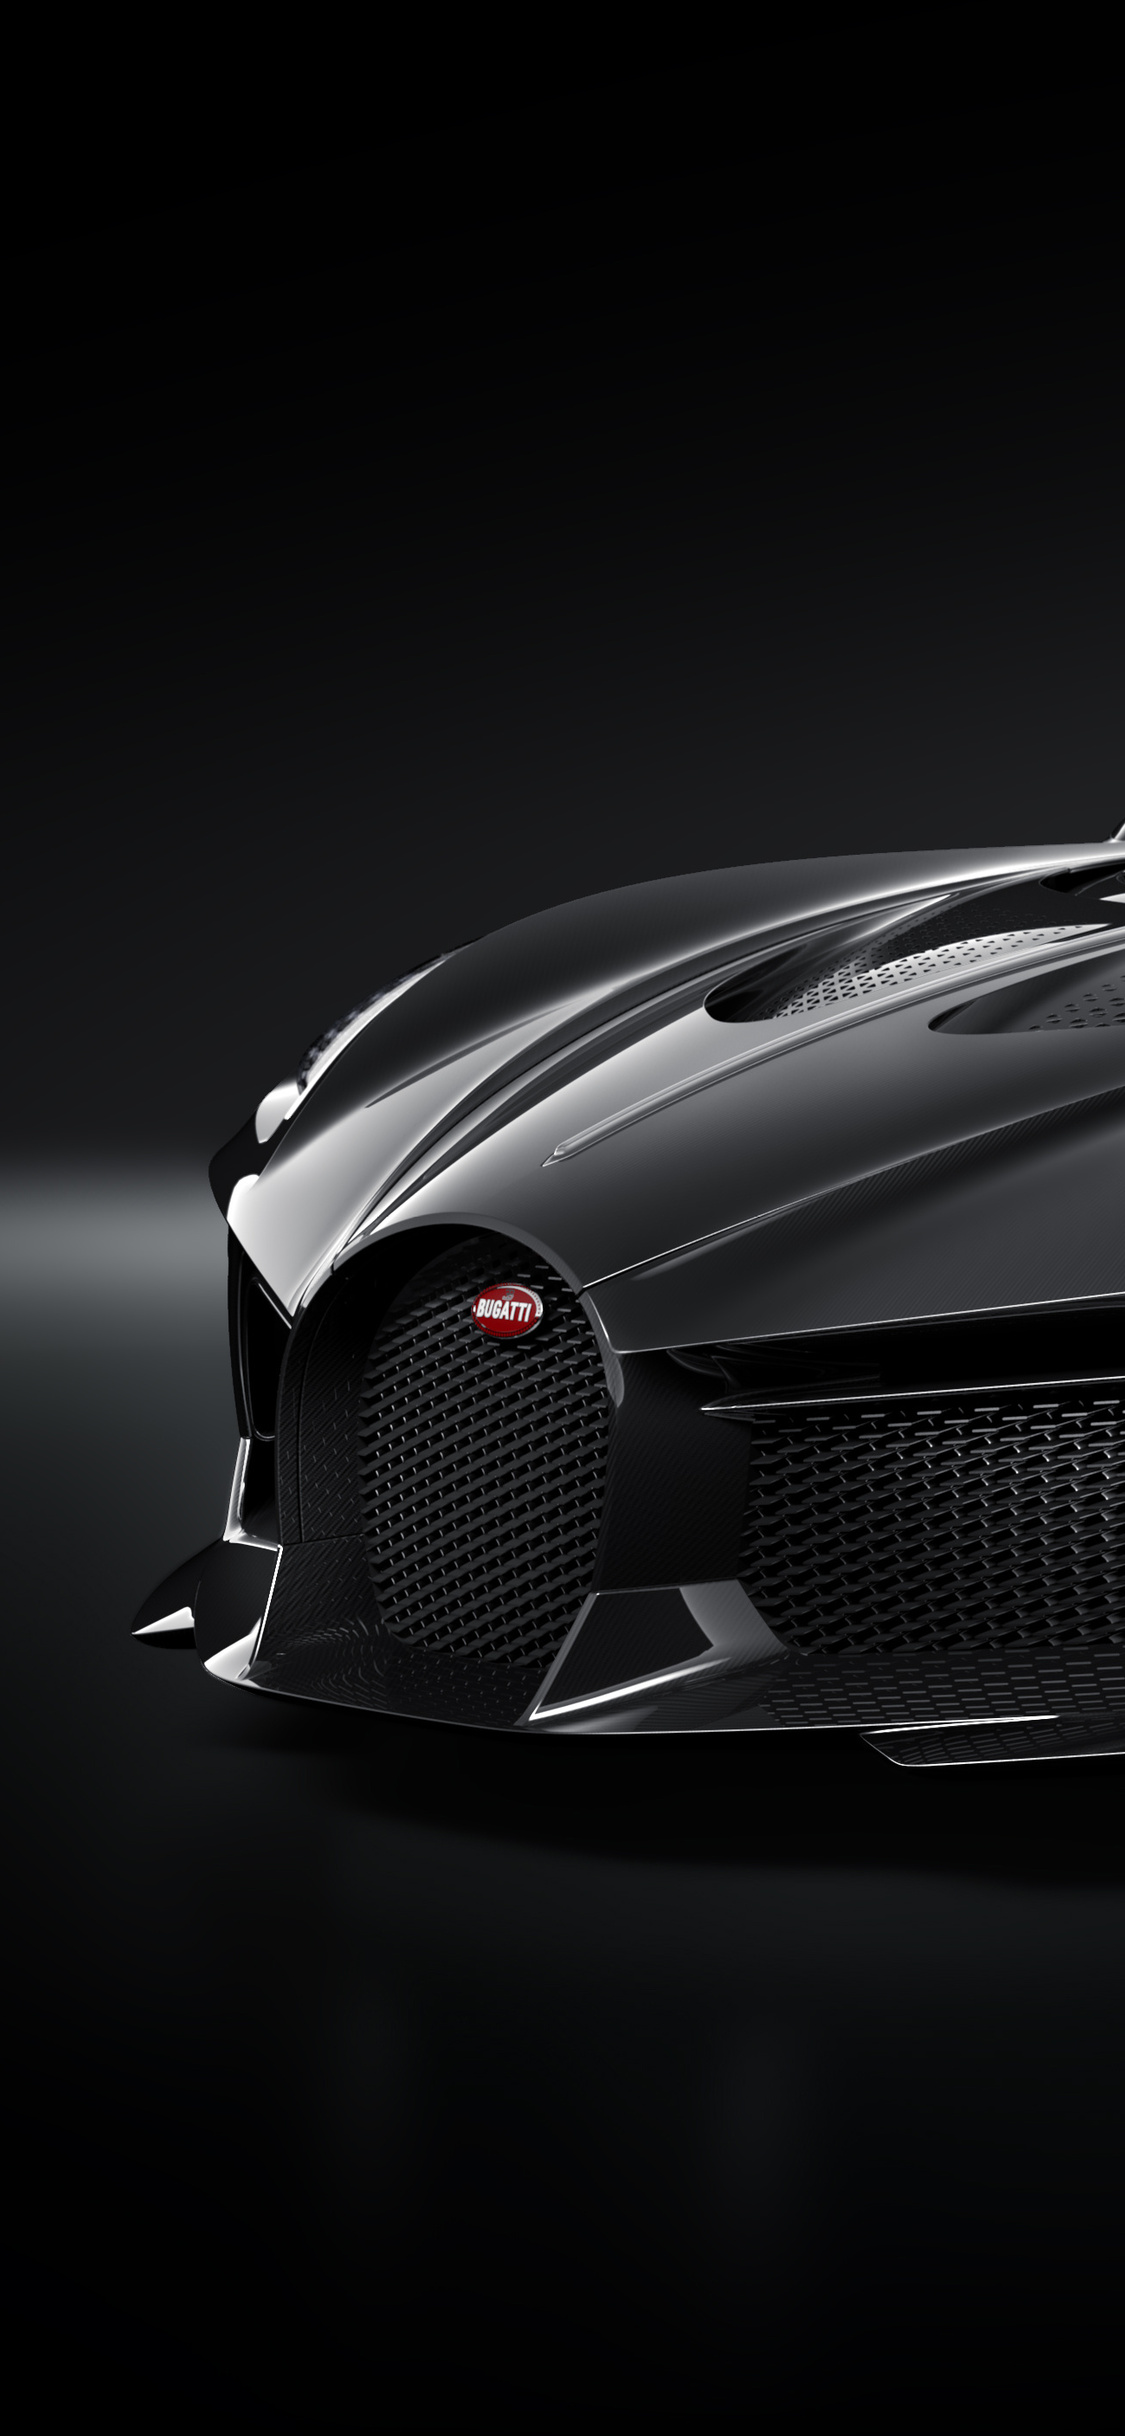 1125x2436 2019 Bugatti La Voiture Noire Iphone Xsiphone 10